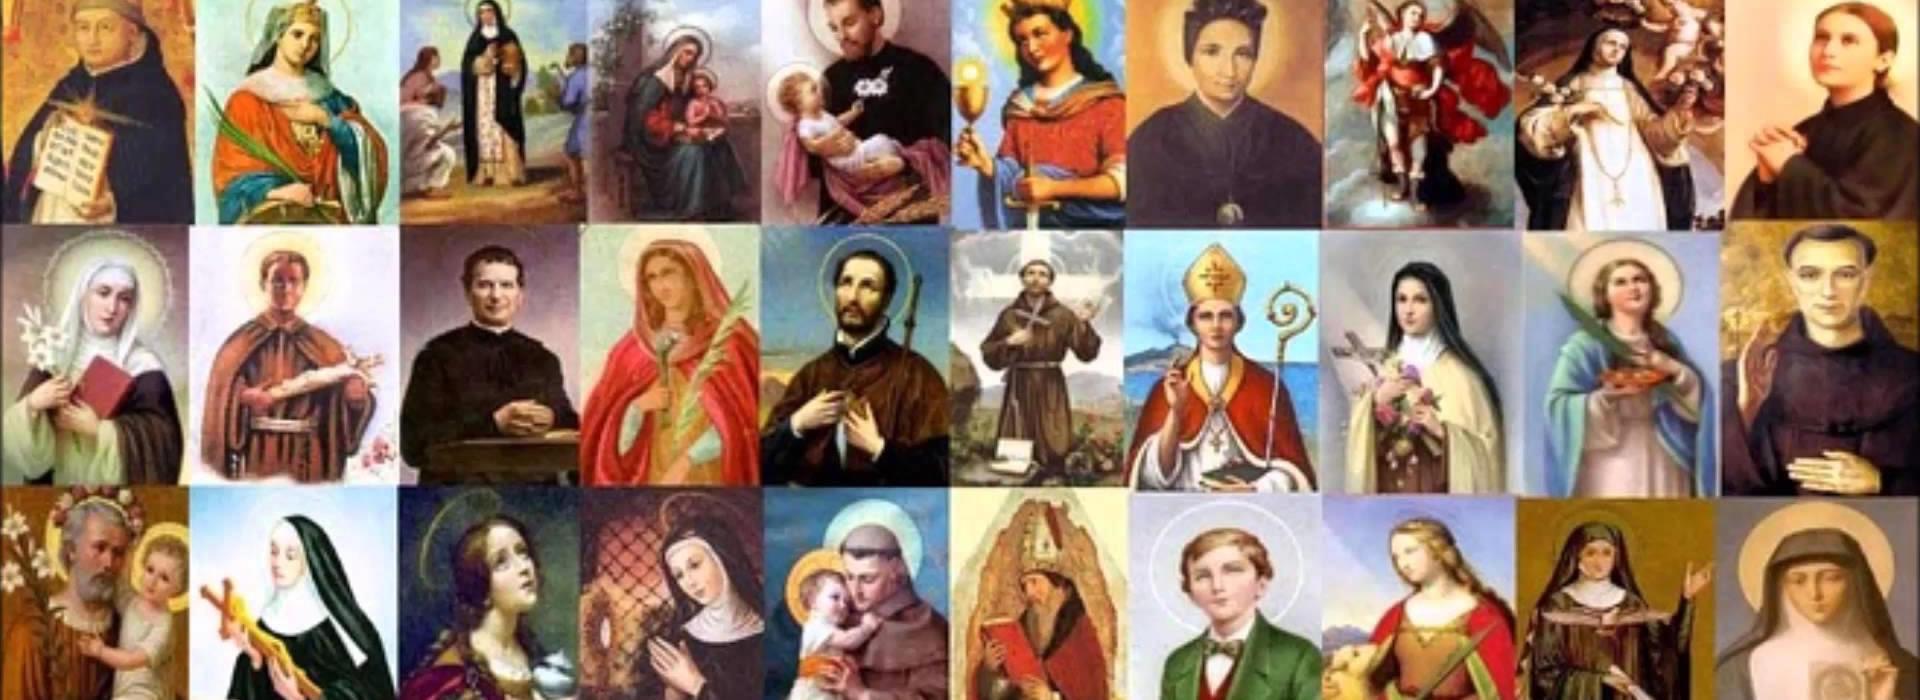 santos-catolicos